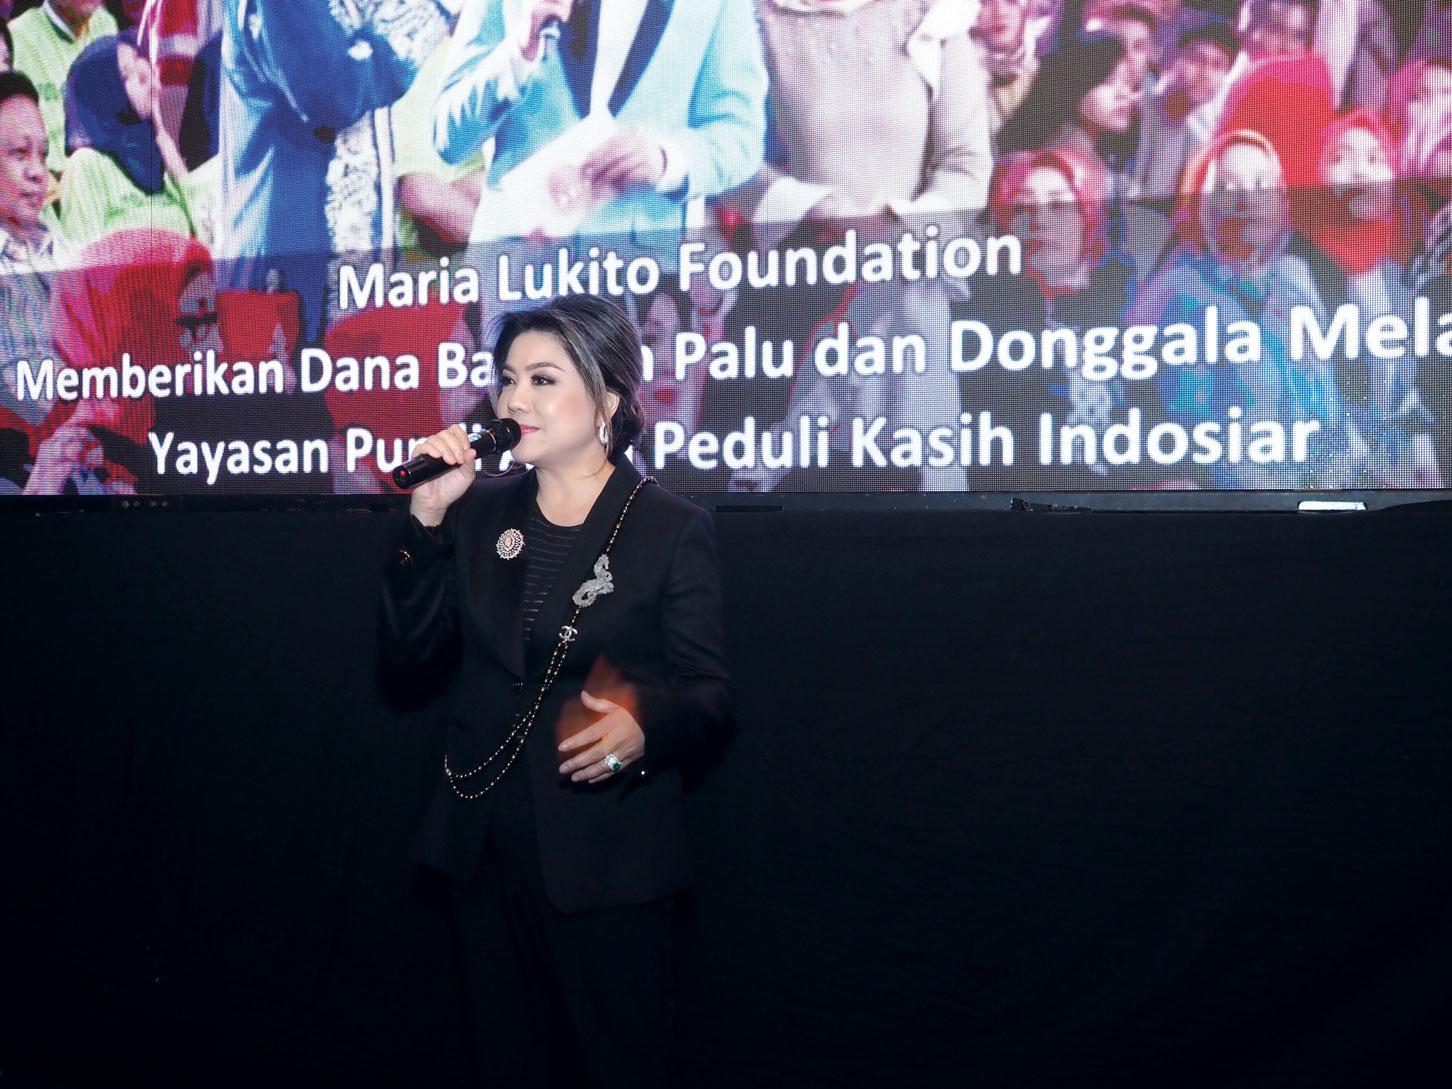 Flagship Annual Event  - Maria Lukito Foundation